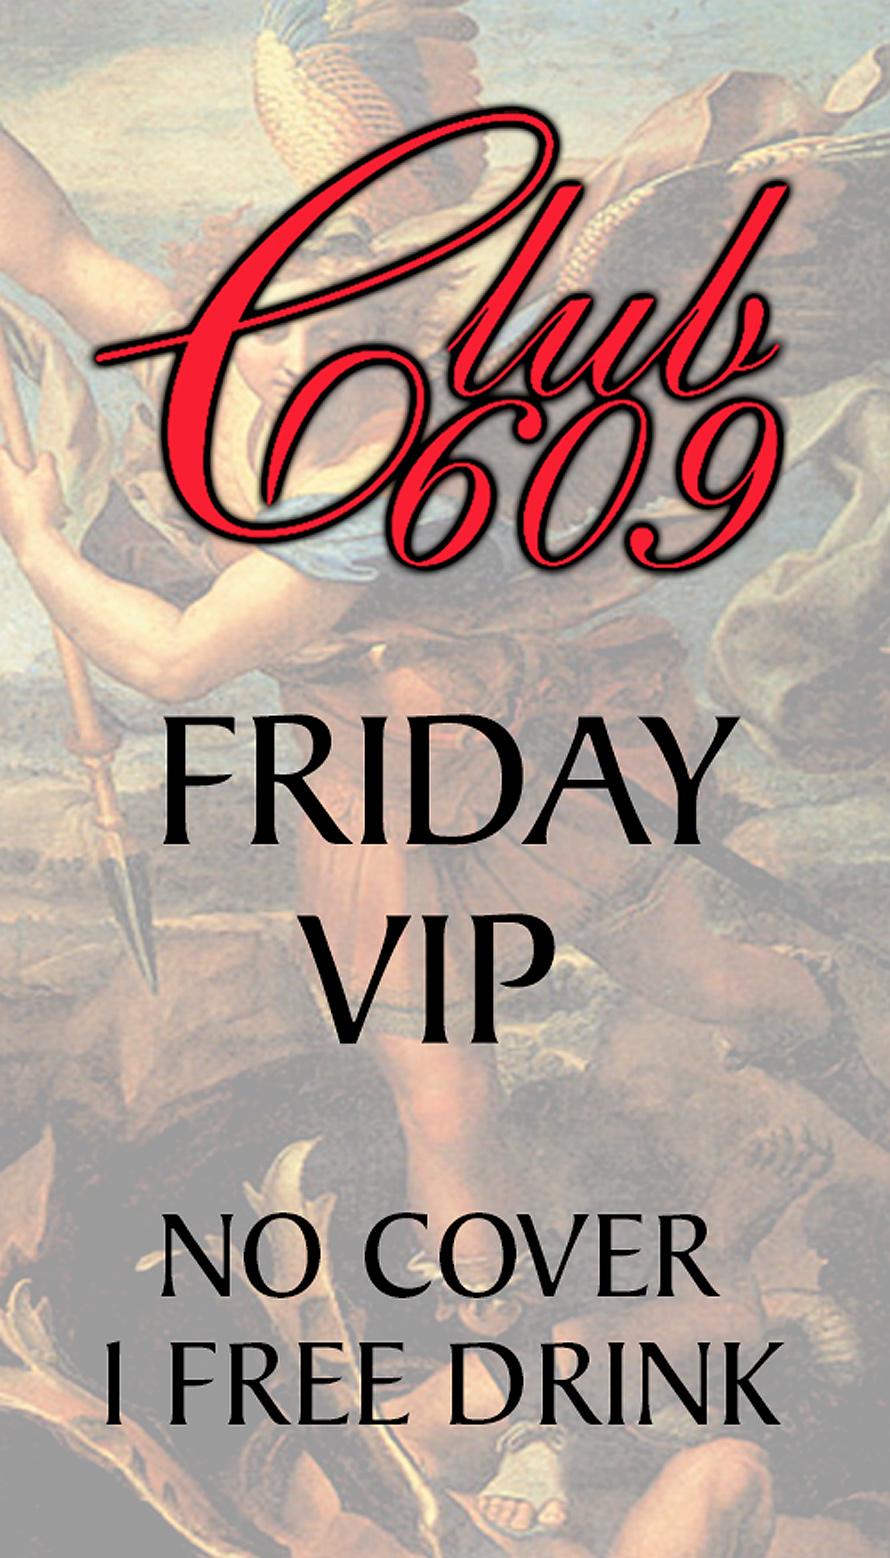 Club 609 Coconut Grove VIP Friday